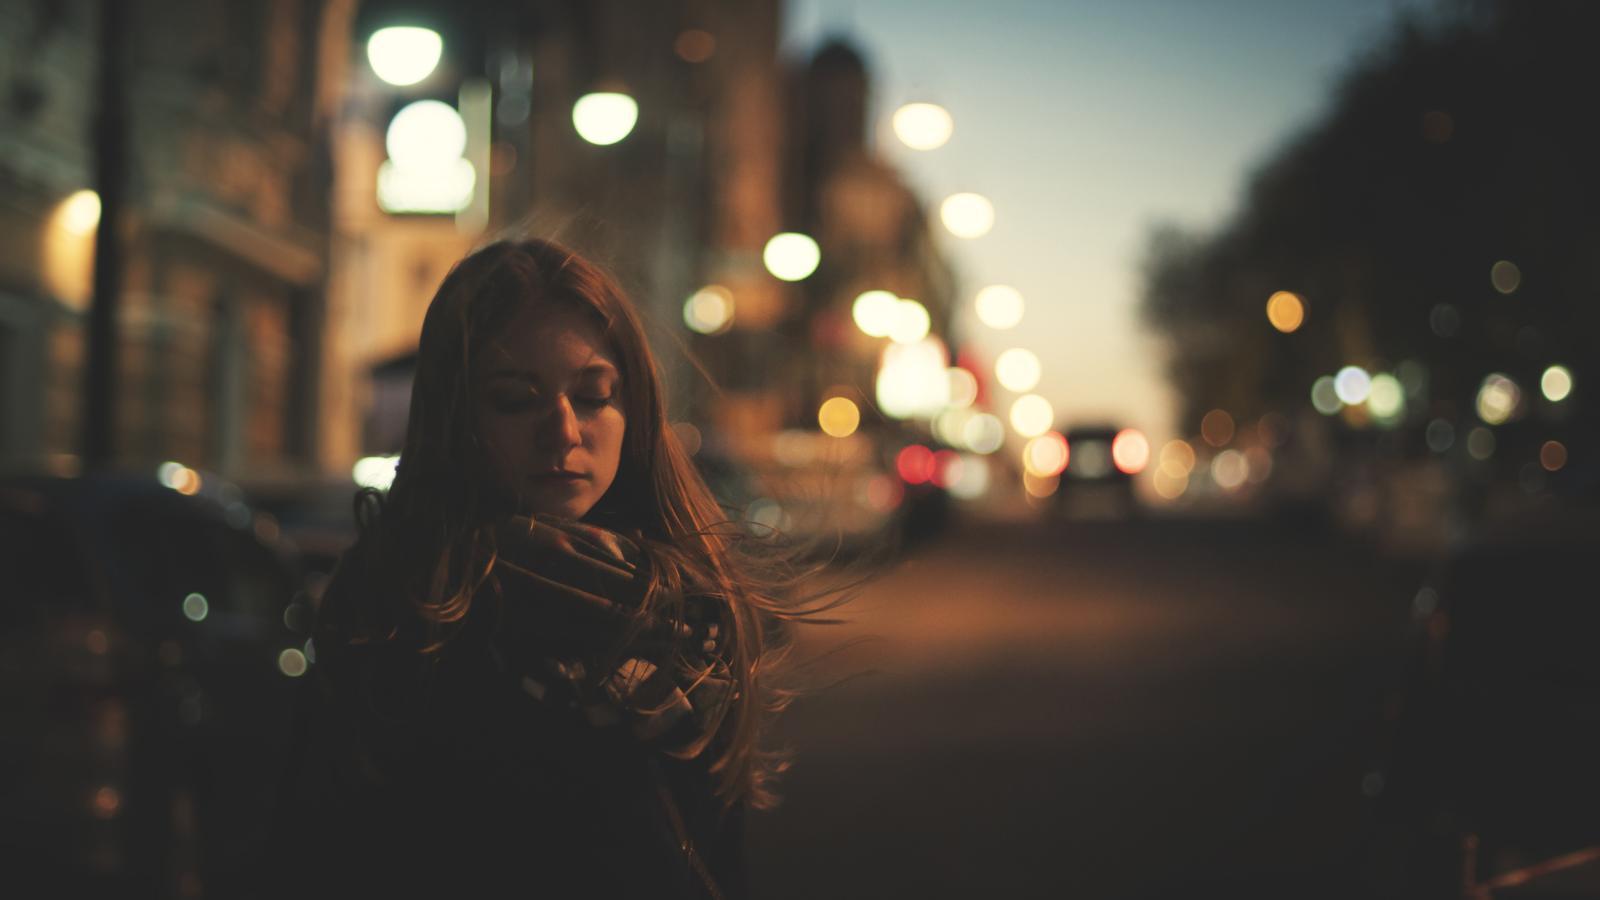 Els tres països europeus on les dones violades tenen prohibit avortar